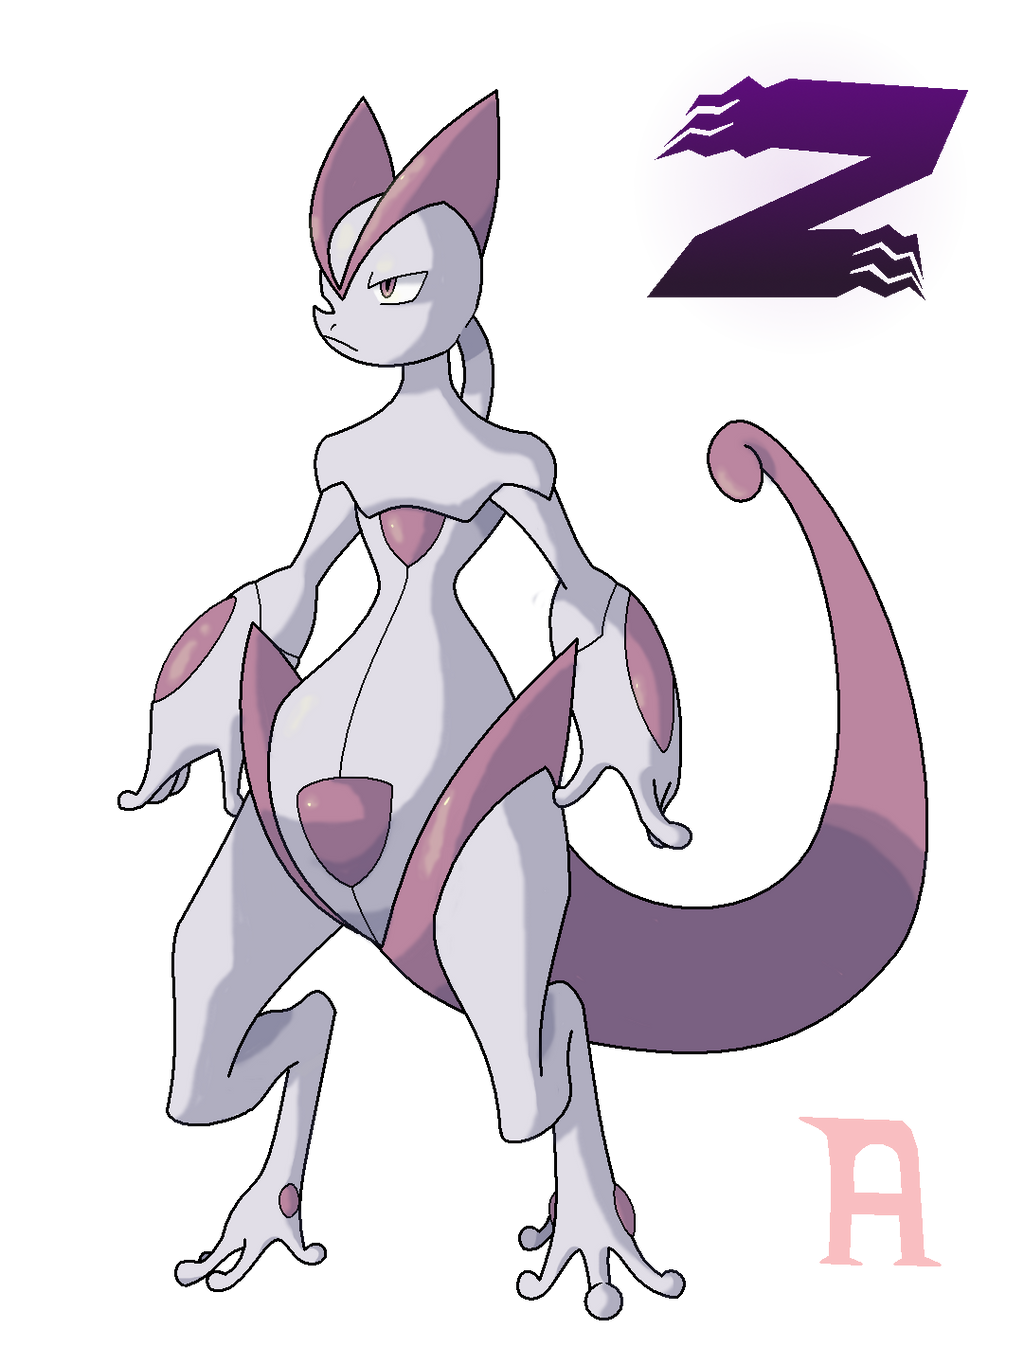 Pokemon Mega Mewtwo Z Images | Pokemon Images